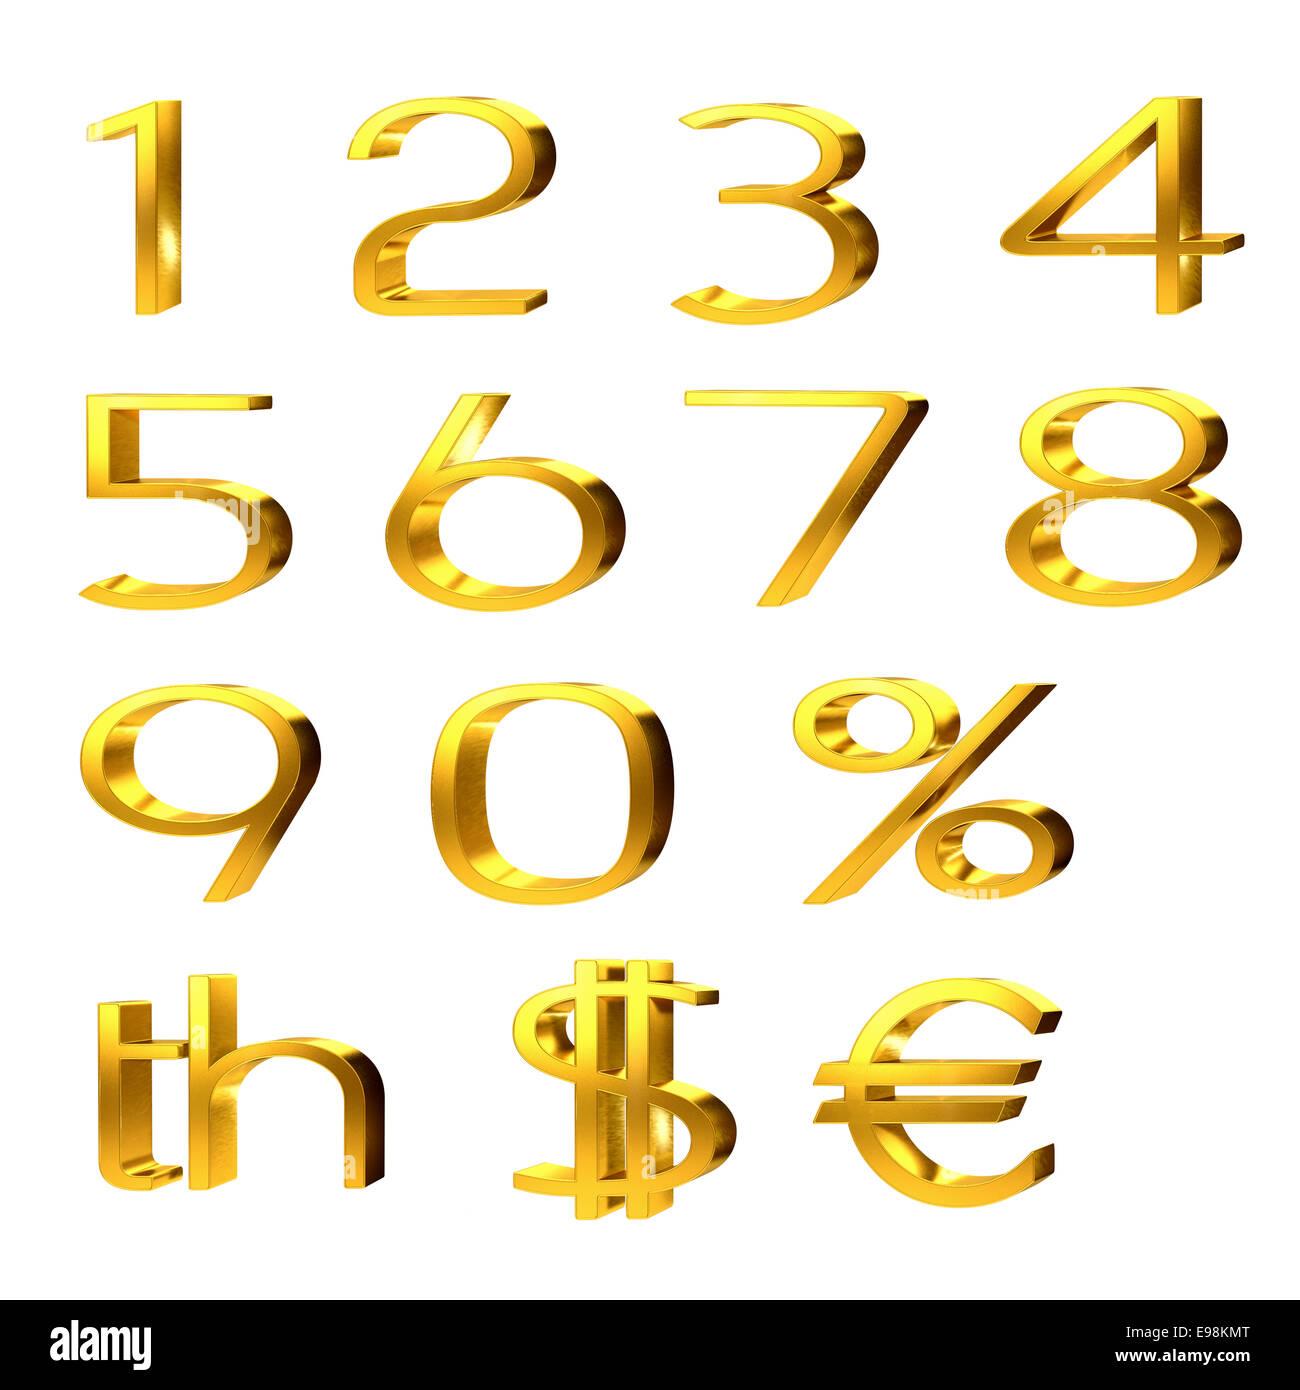 Pound Symbols Stock Photos Pound Symbols Stock Images Alamy